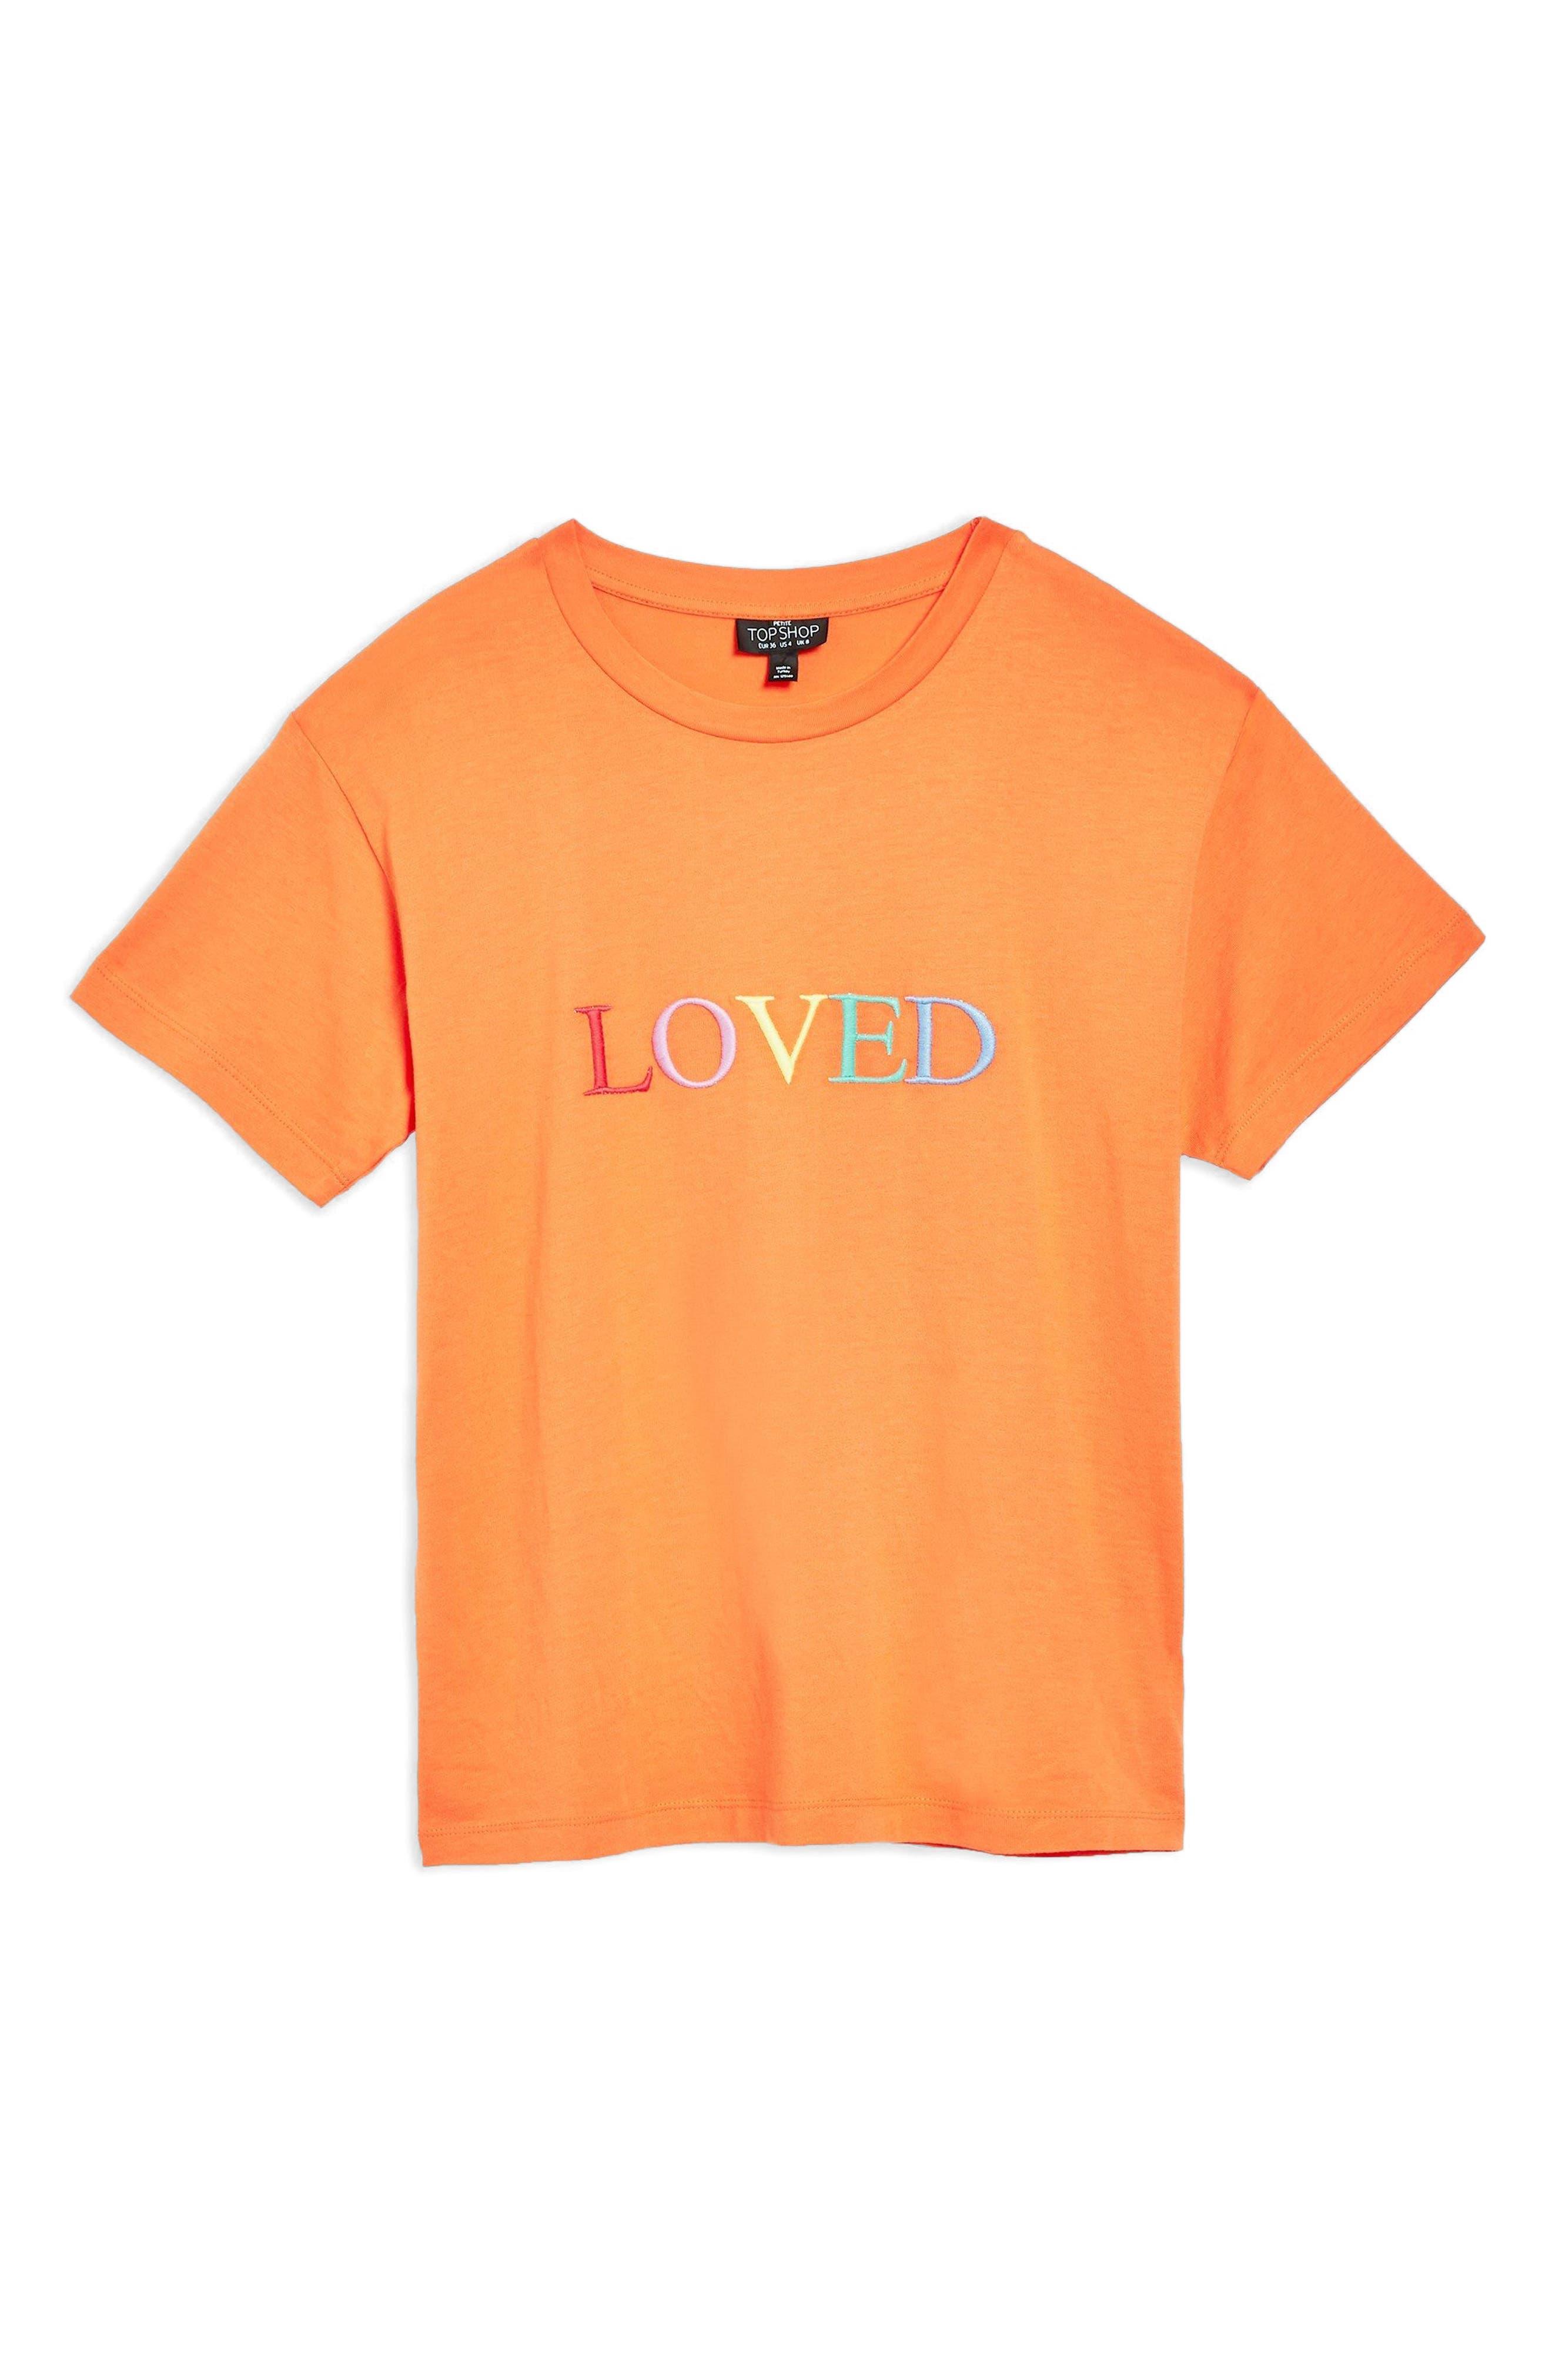 Loved Embroidered Tee,                             Alternate thumbnail 4, color,                             Orange